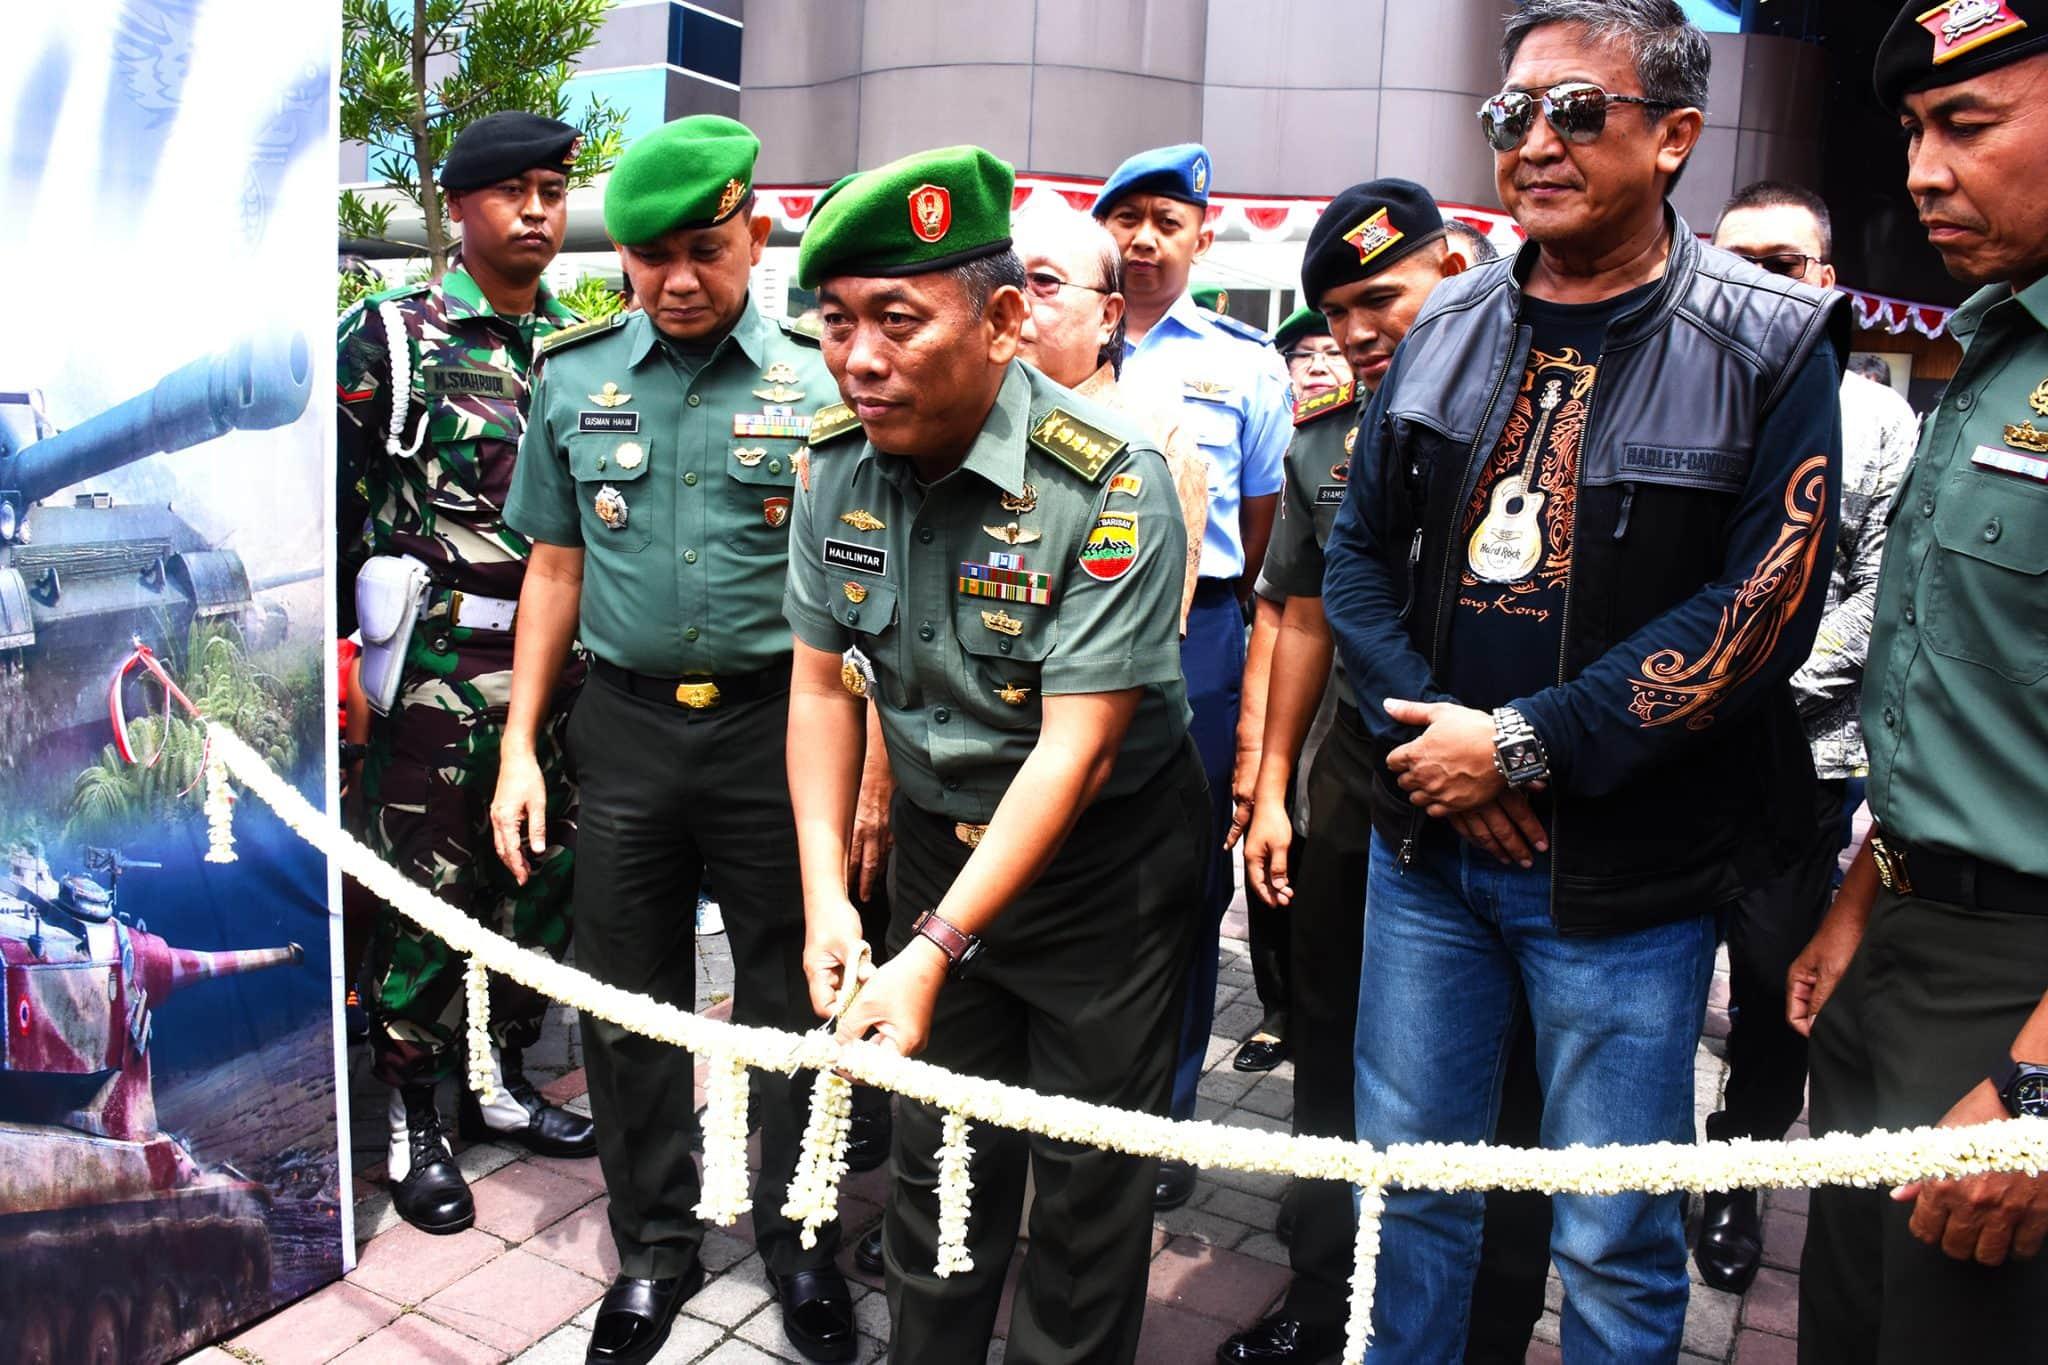 TNI Gelar Pameran Alutsista Sebagai Bukti TNI Manunggal Dengan Rakyat